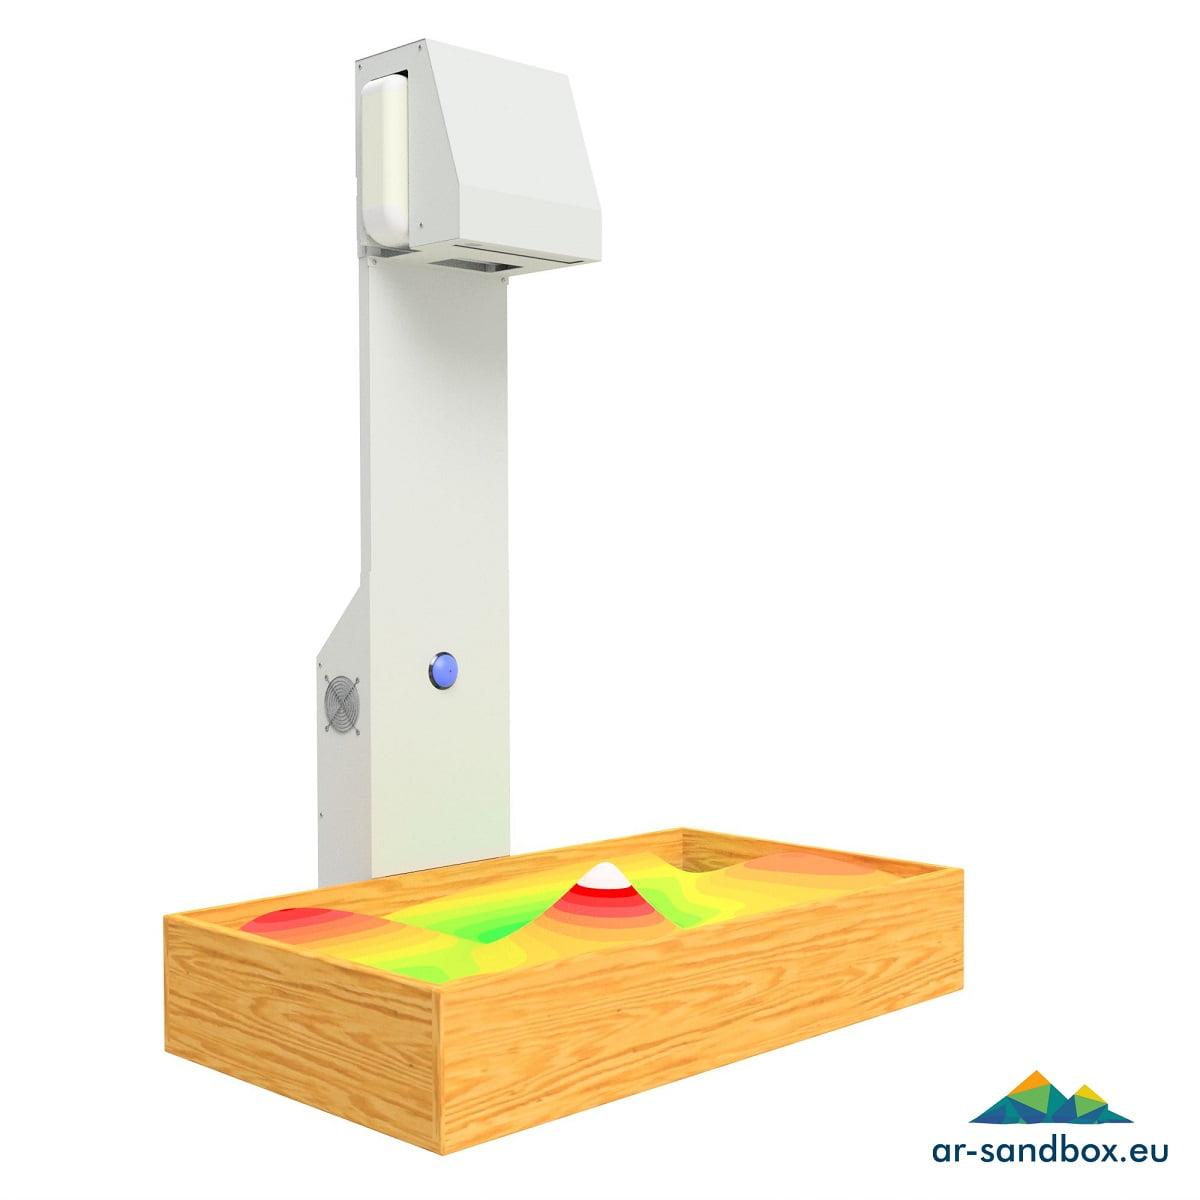 Augmented Reality Sandbox – Home Model